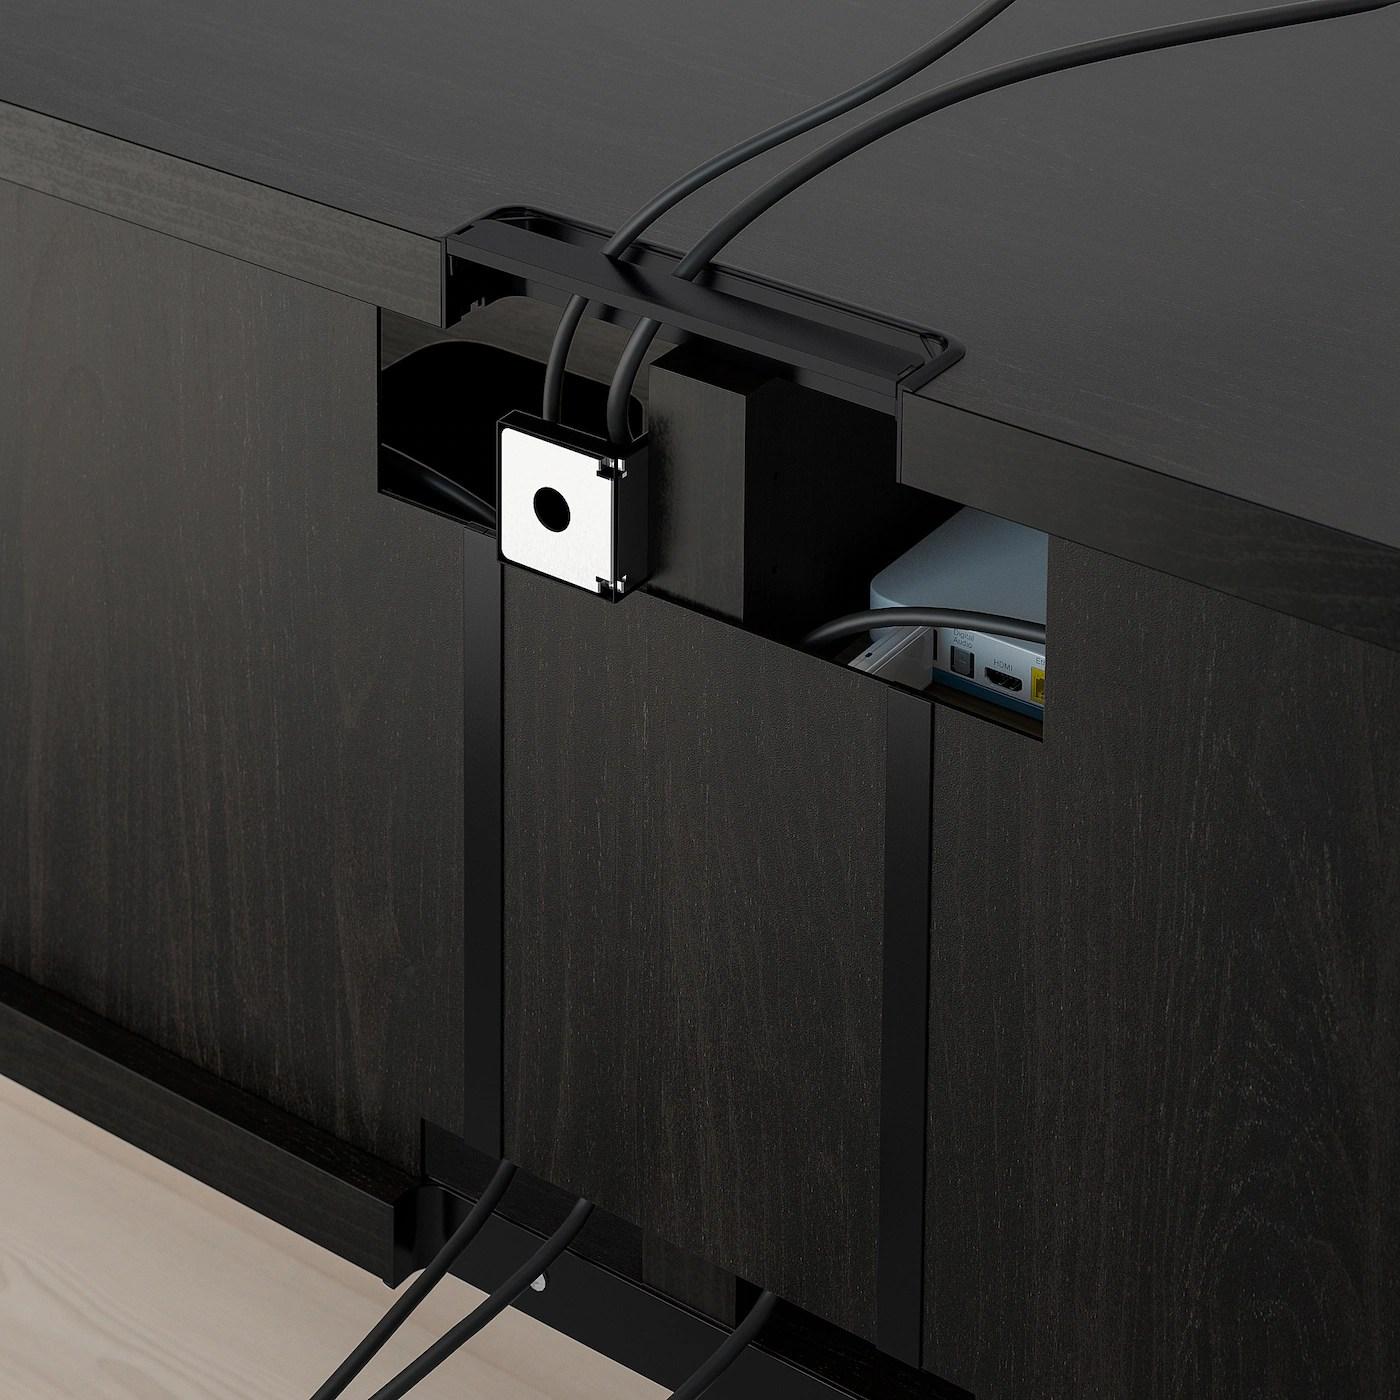 besta banc tv brun noir 120x40x38 cm